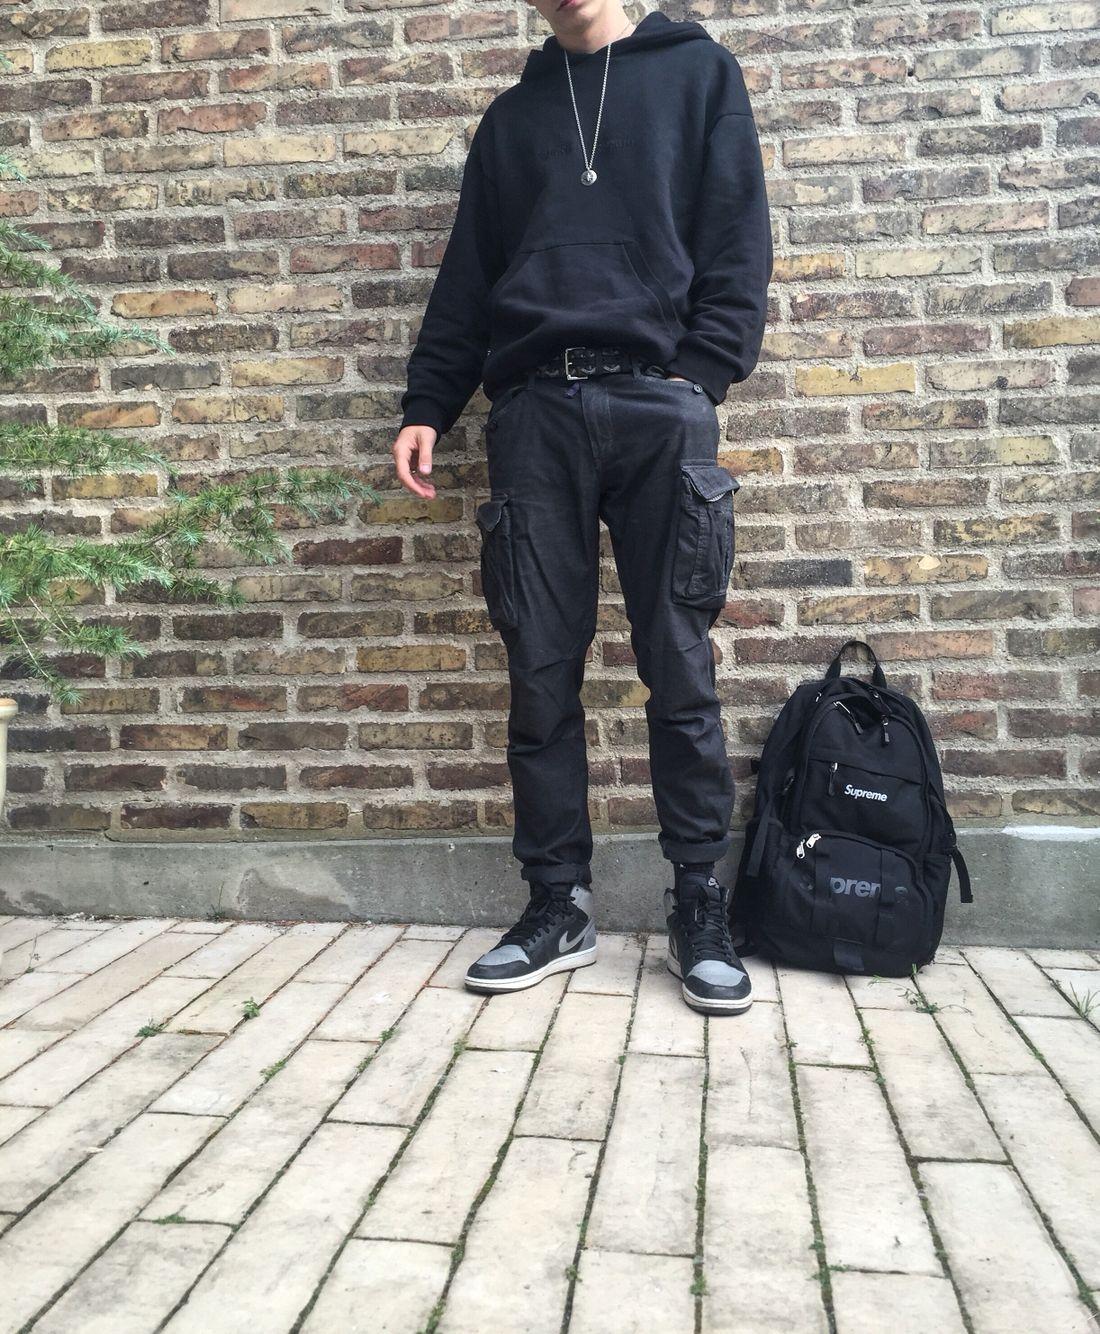 77941ea2f0f Mcqueen chain Gosha hoodie Goyard belt Gant cargo pants Jordan 1 shadows  Supreme SS15 backpack